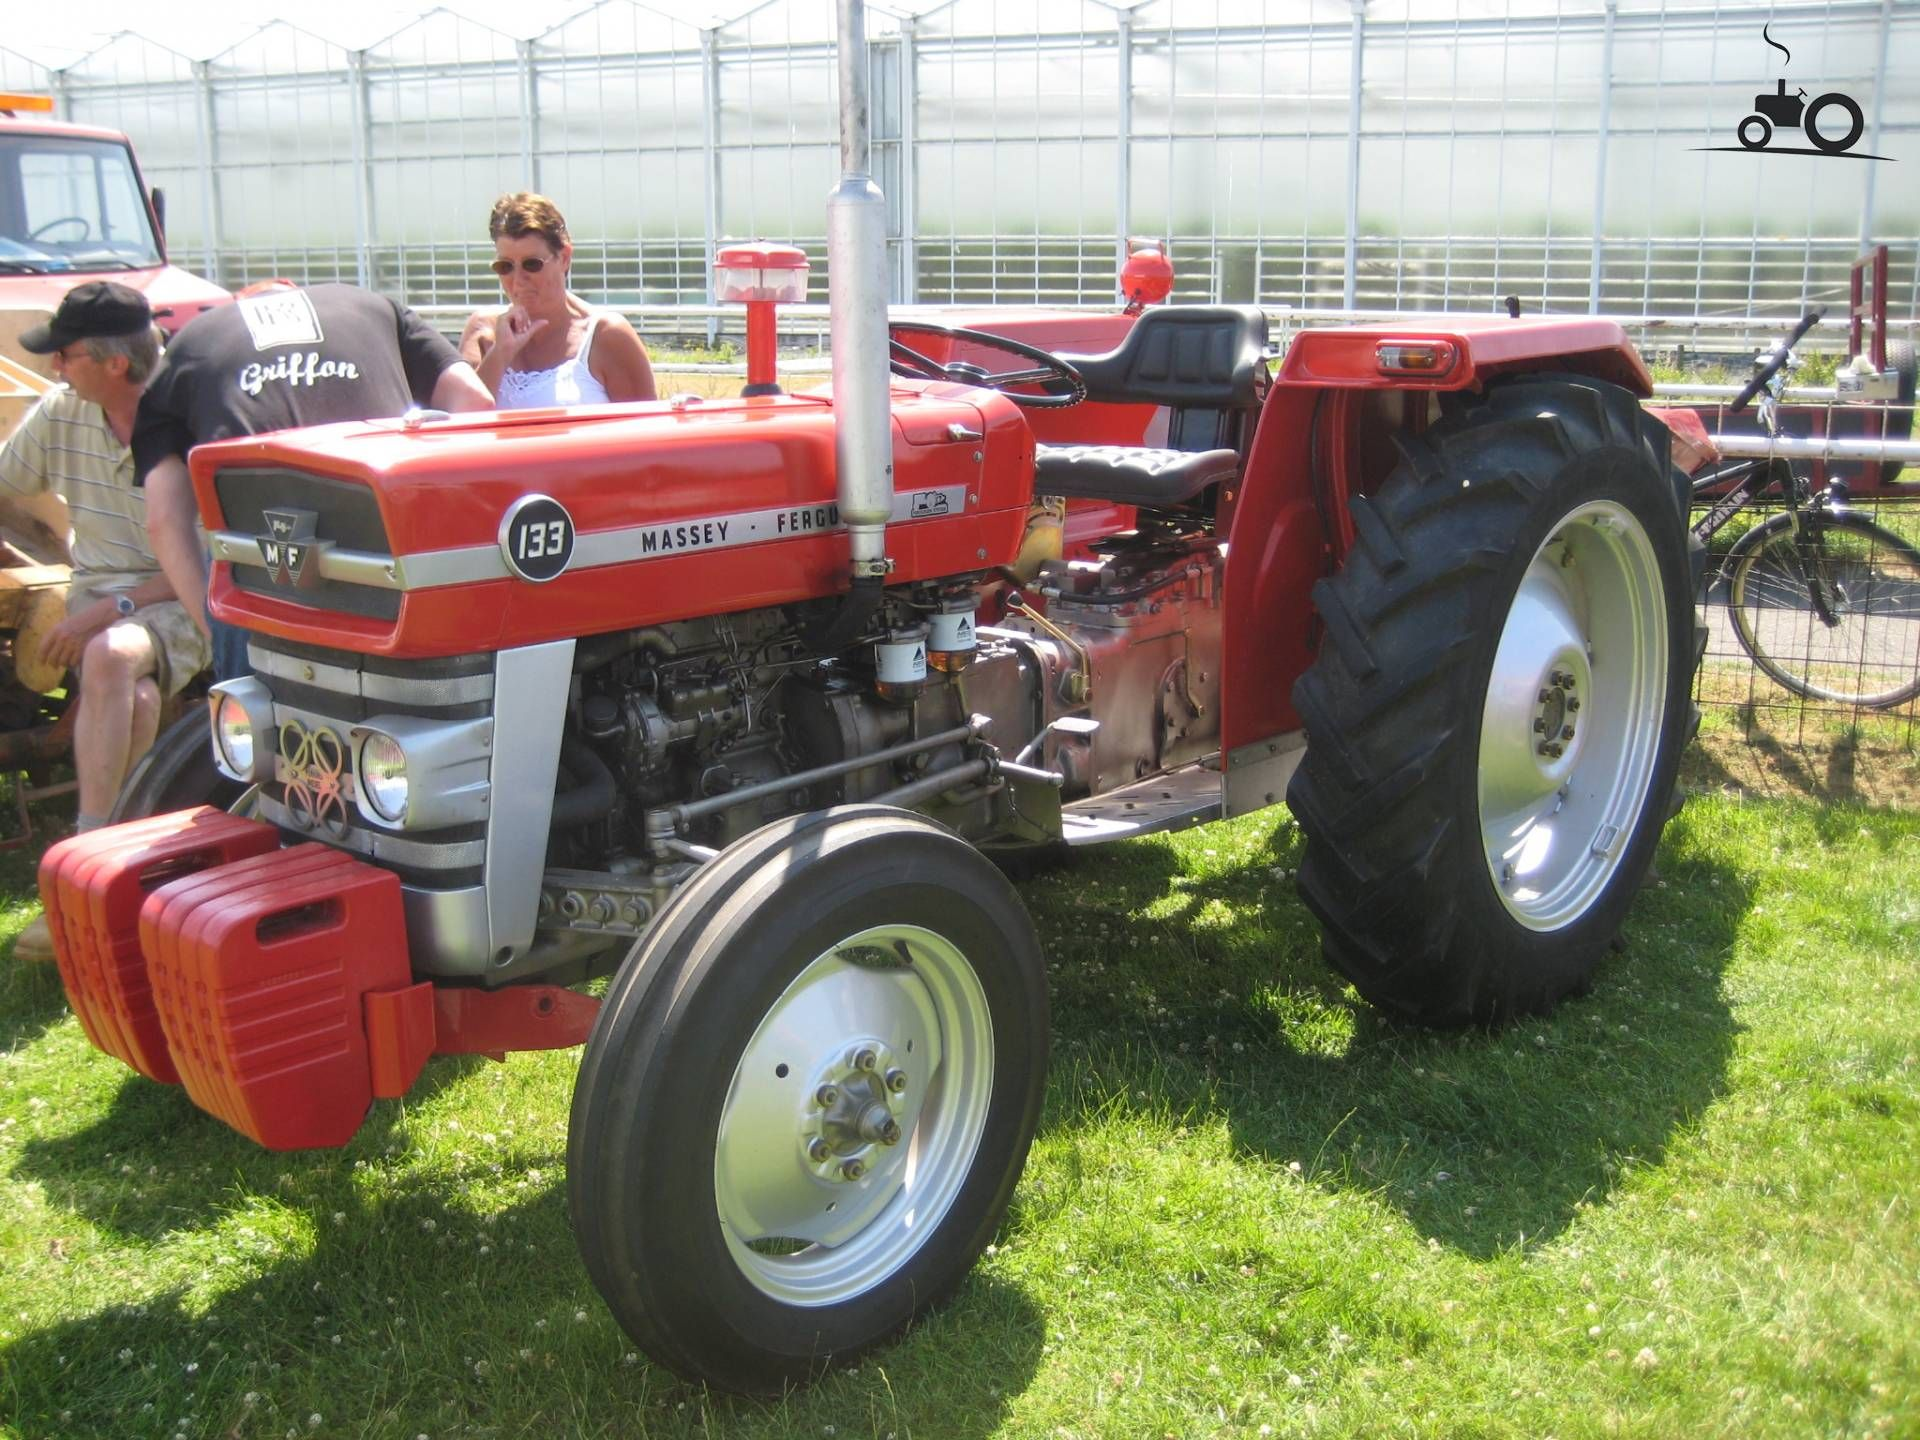 Massey-Ferguson 133